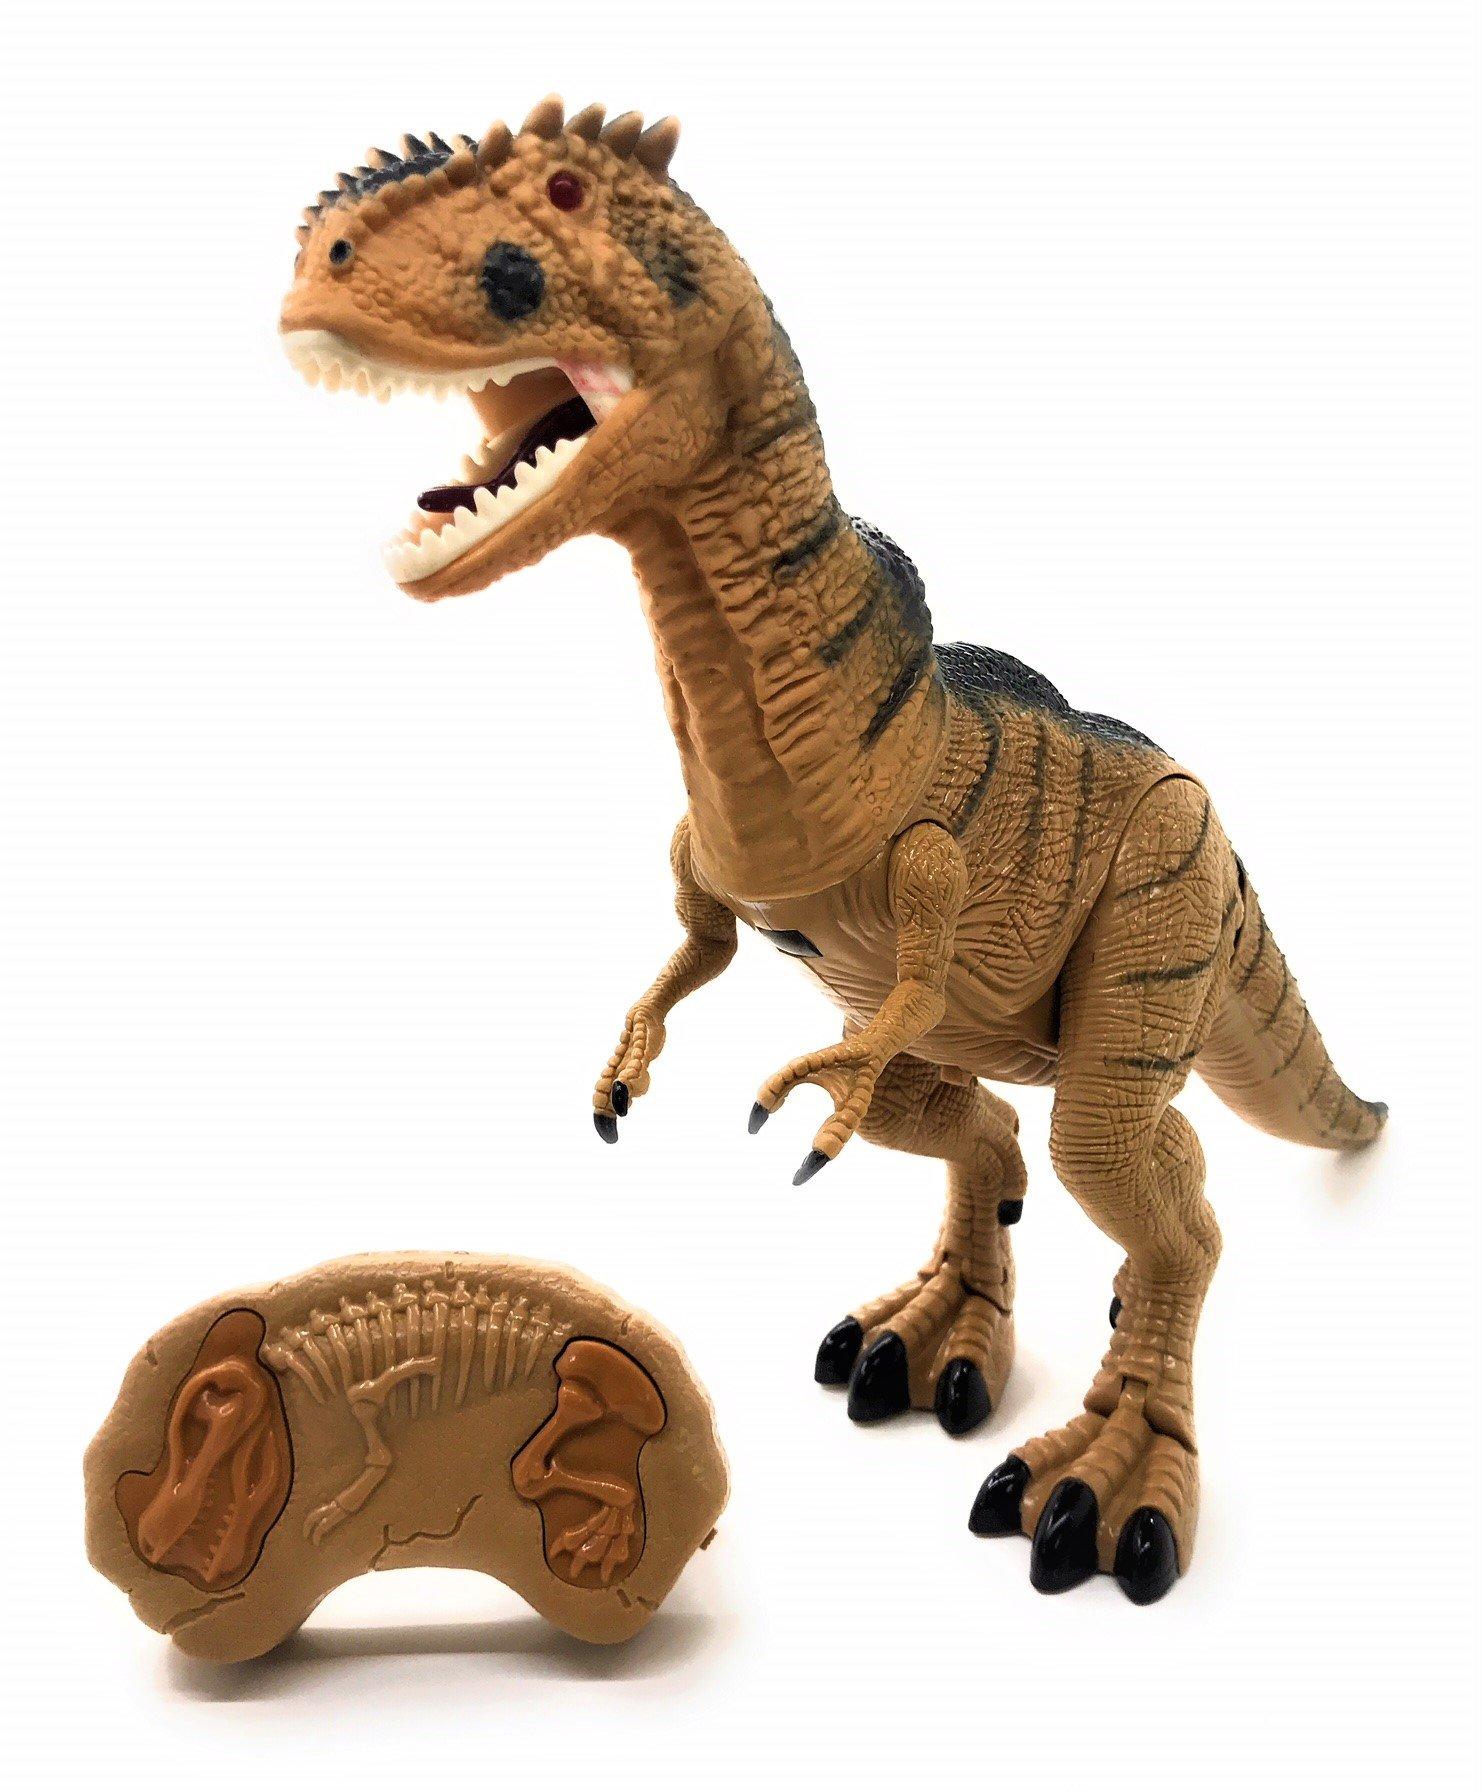 O.B Toys&Gift Dinosaur Walking Toy Remote Control Tyrannosaurus Rex RC T Rex Head Shakes, Lights & Sounds Christmas gift